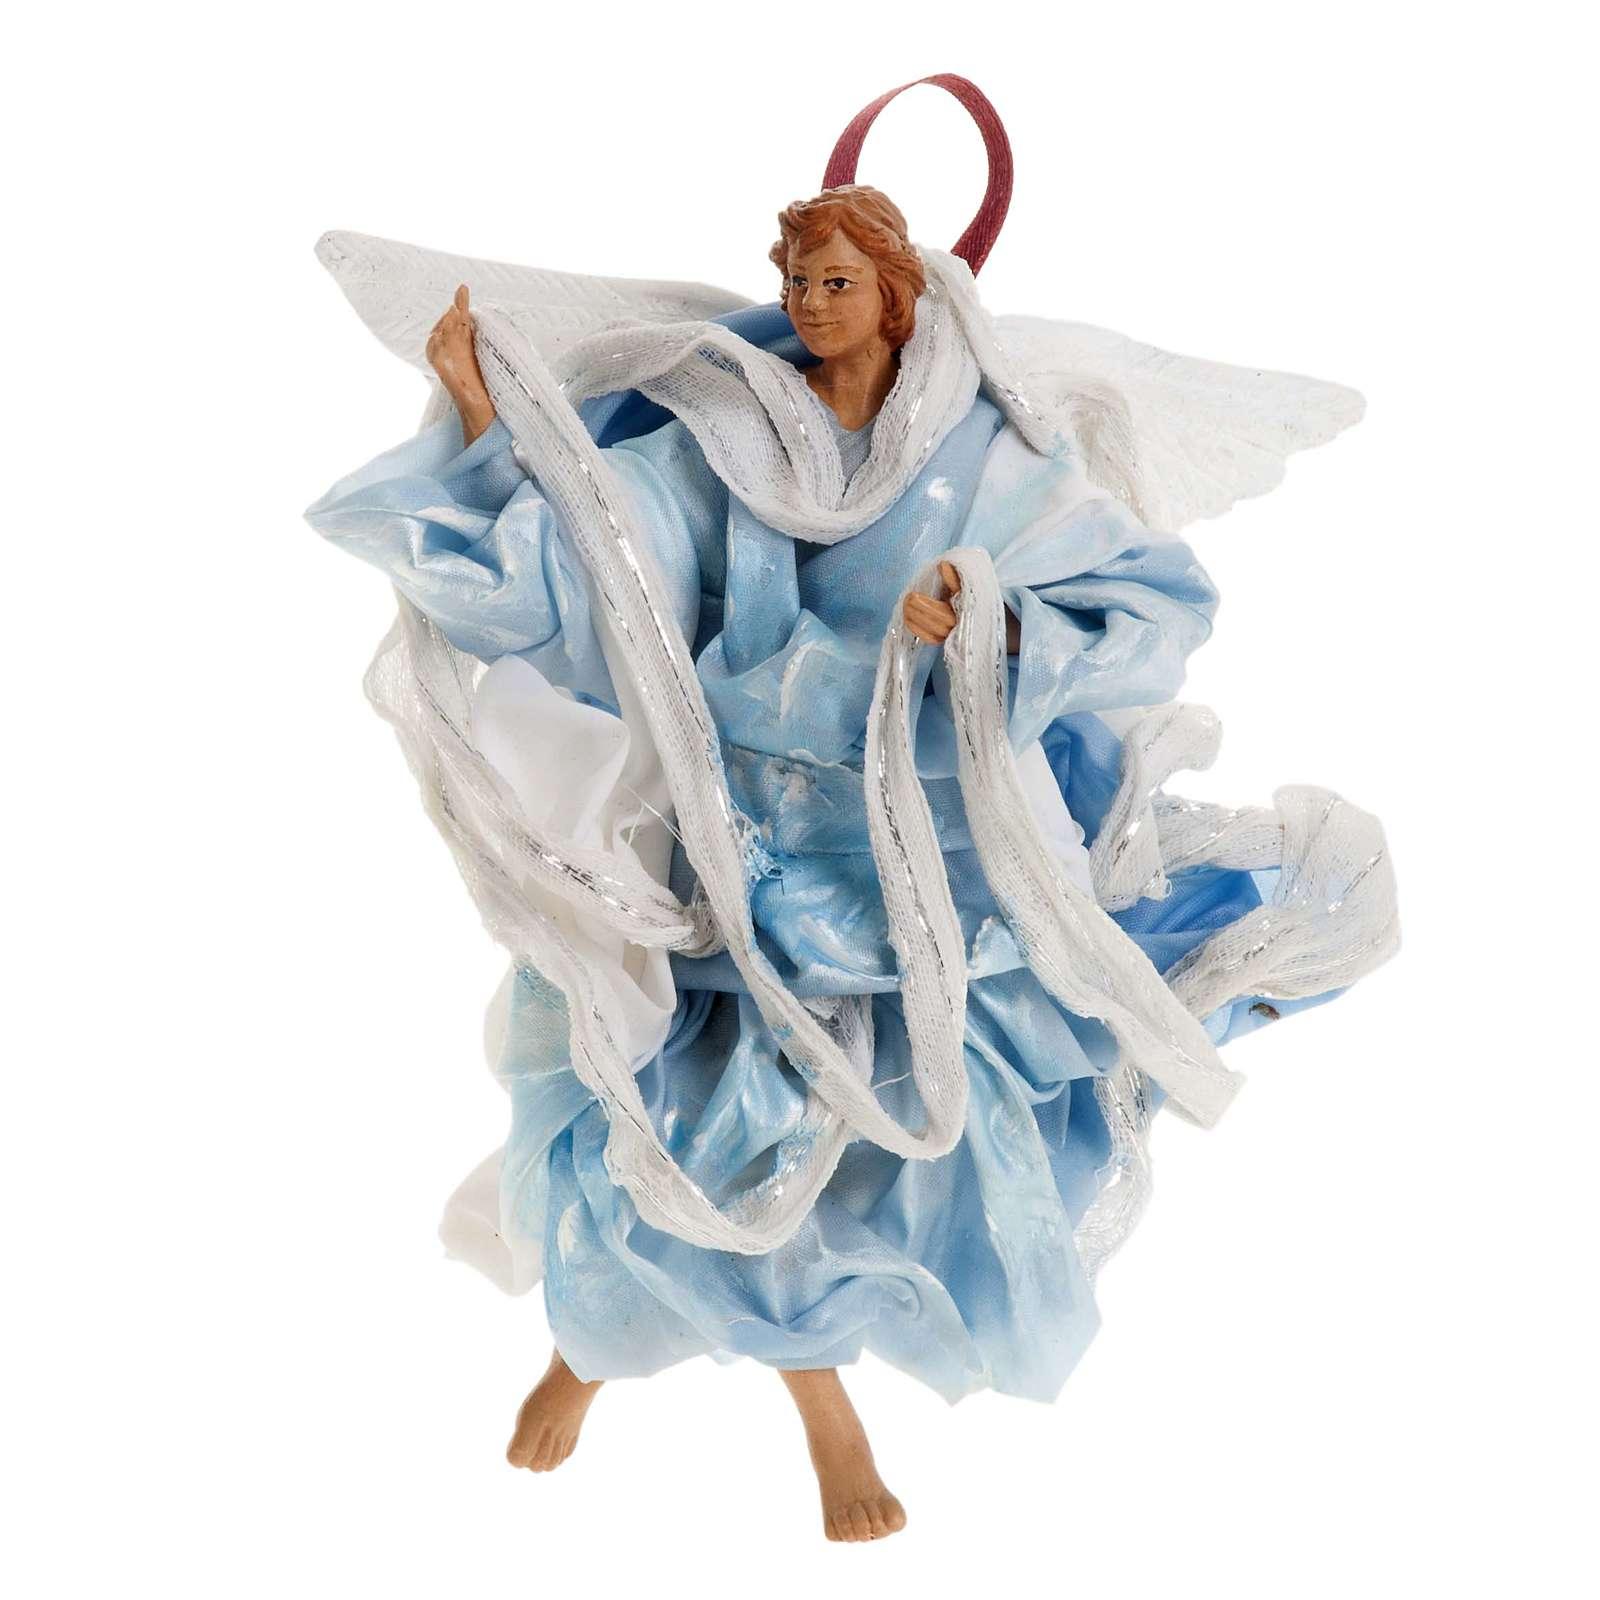 Neapolitan nativity figurine, blue angel 18cm 4